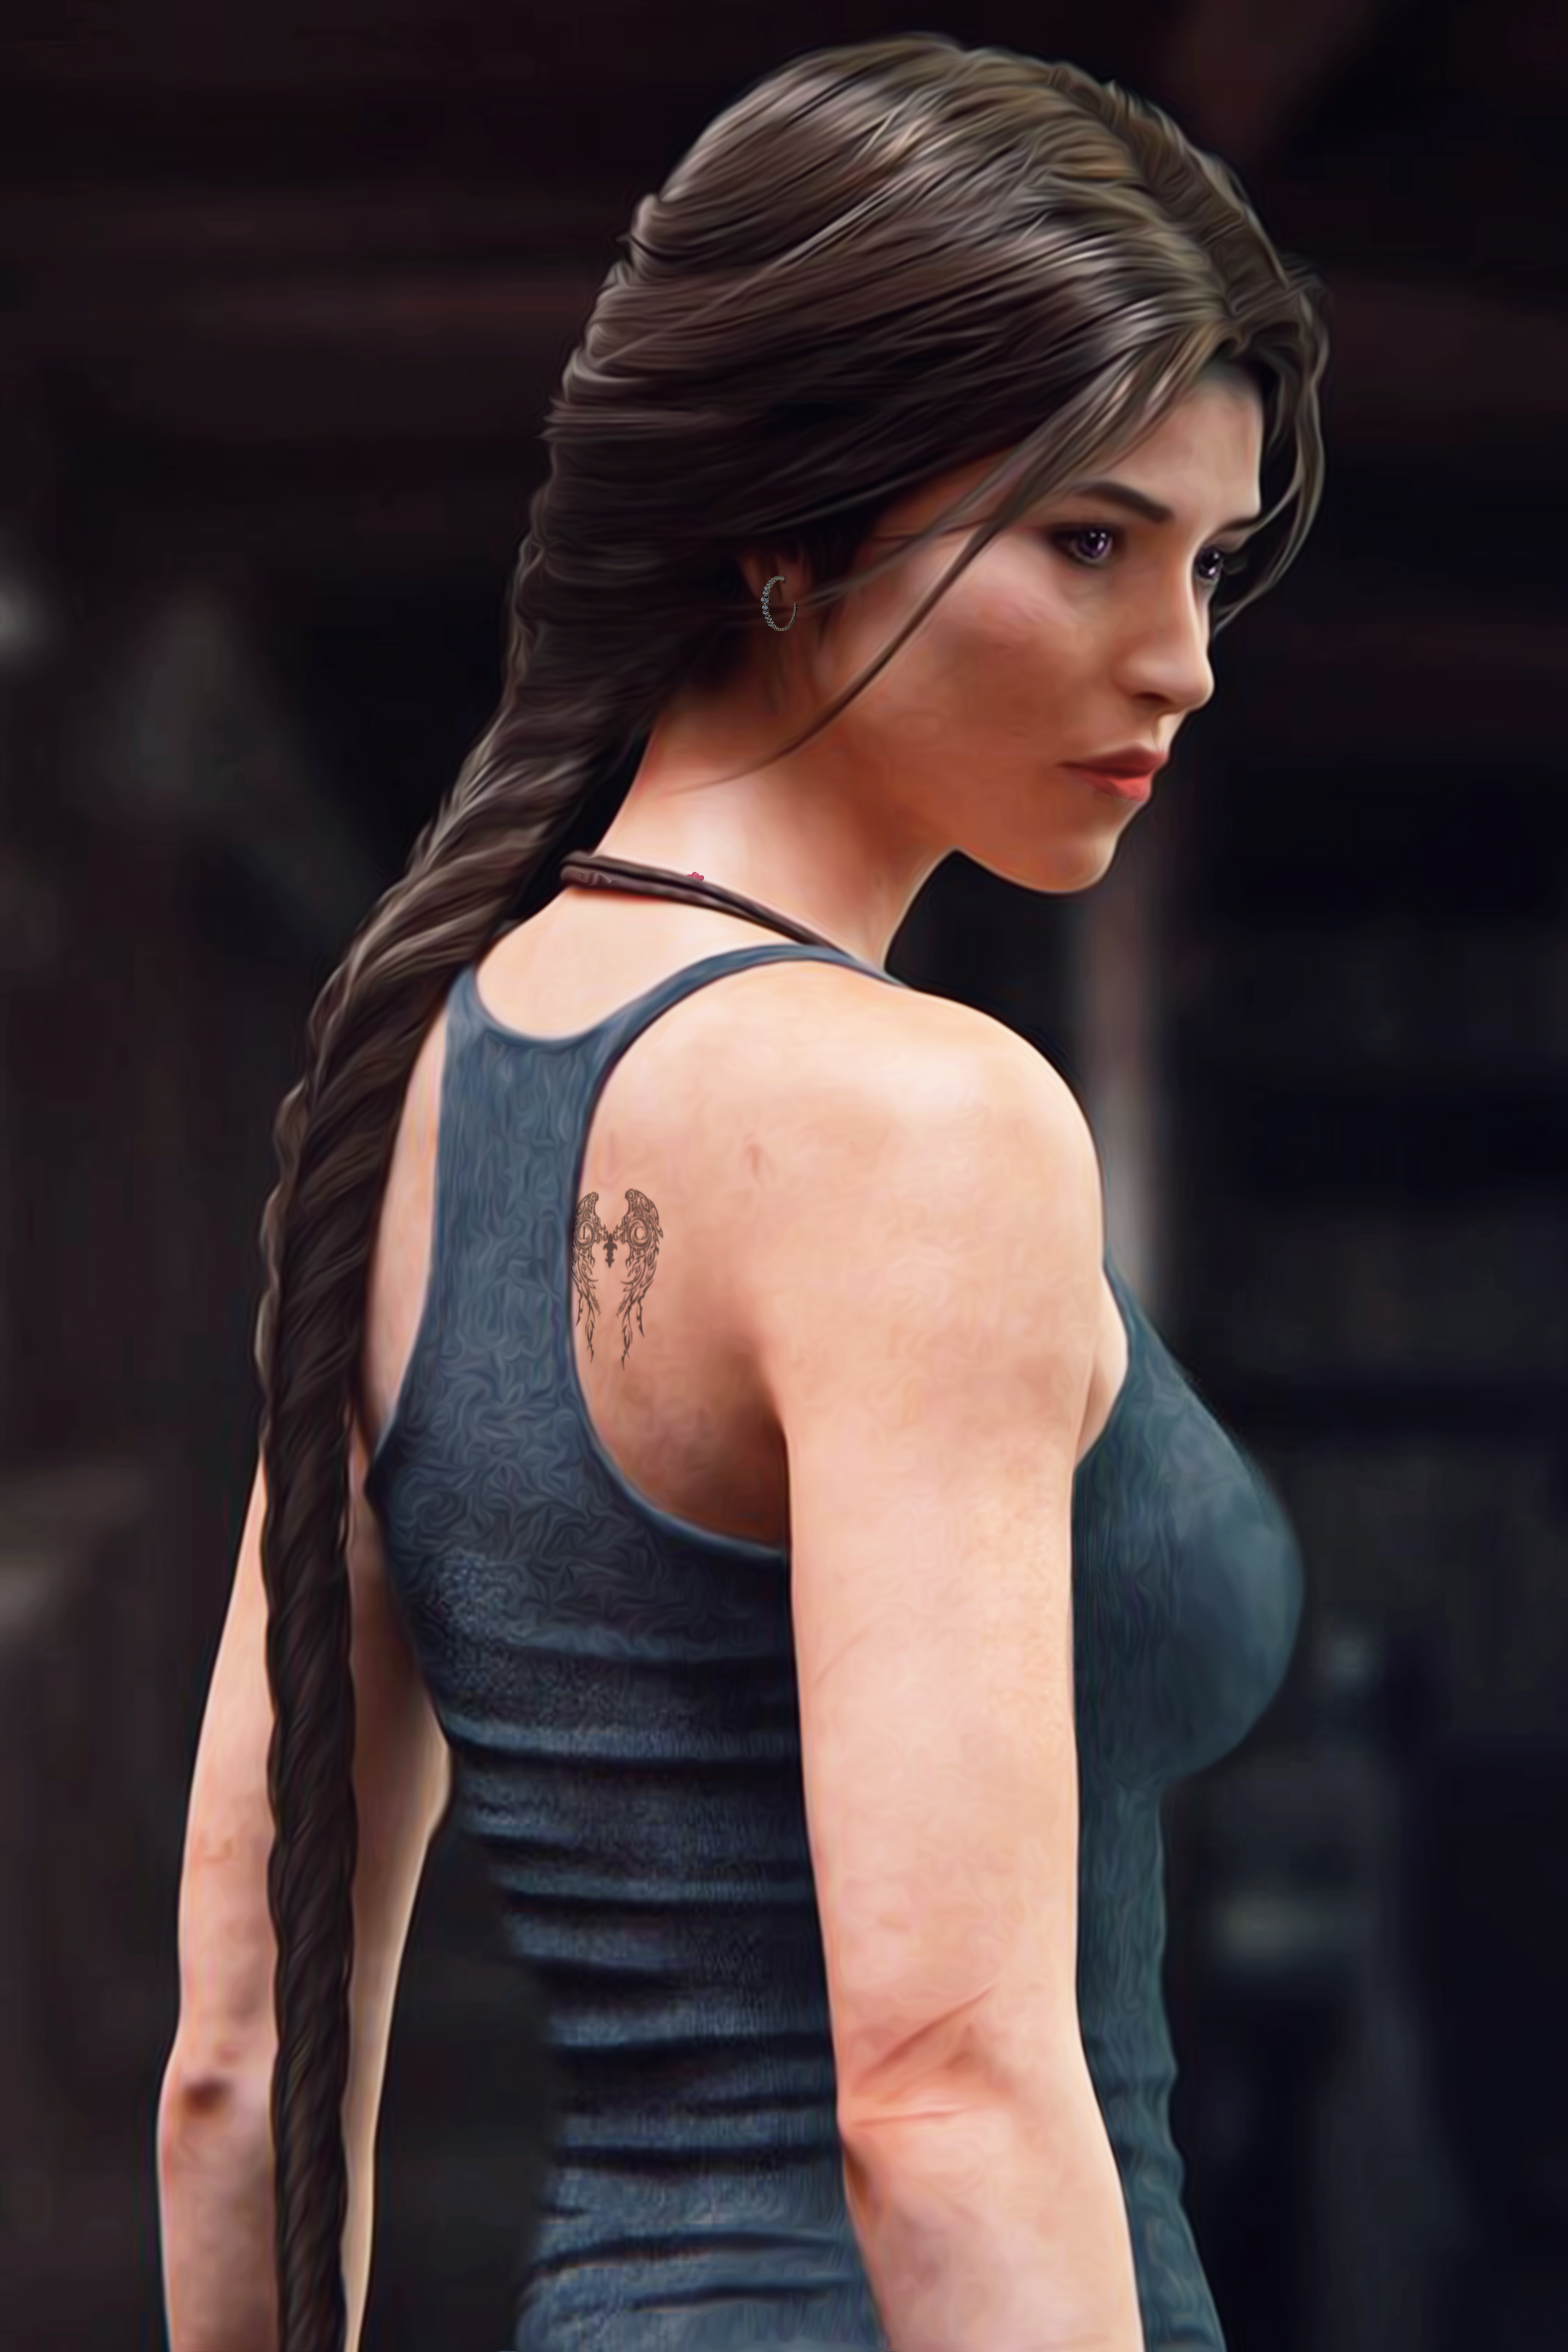 General 3400x5100 Lara Croft tattoo skinny long hair purple eyes Tomb Raider Shadow of the Tomb Raider